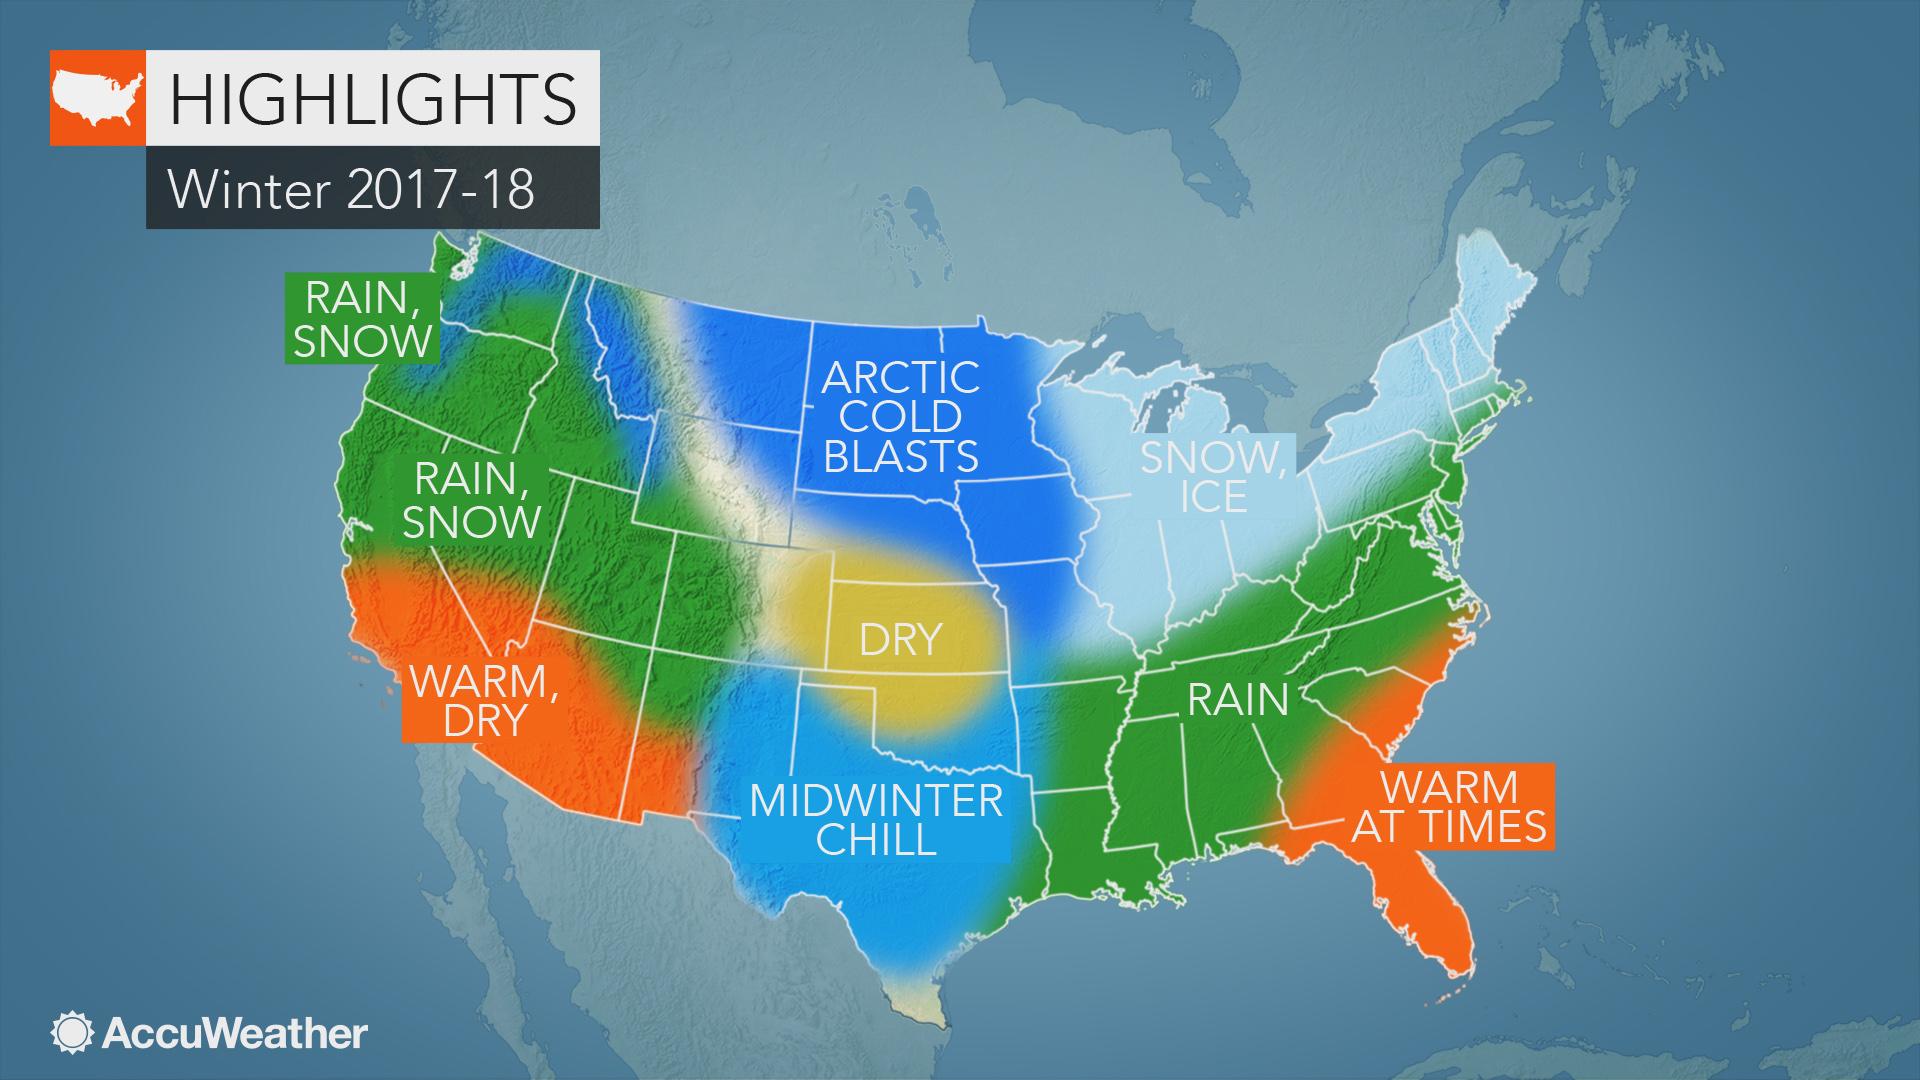 US winter forecast: La Niña to fuel abundant snow in Rockies